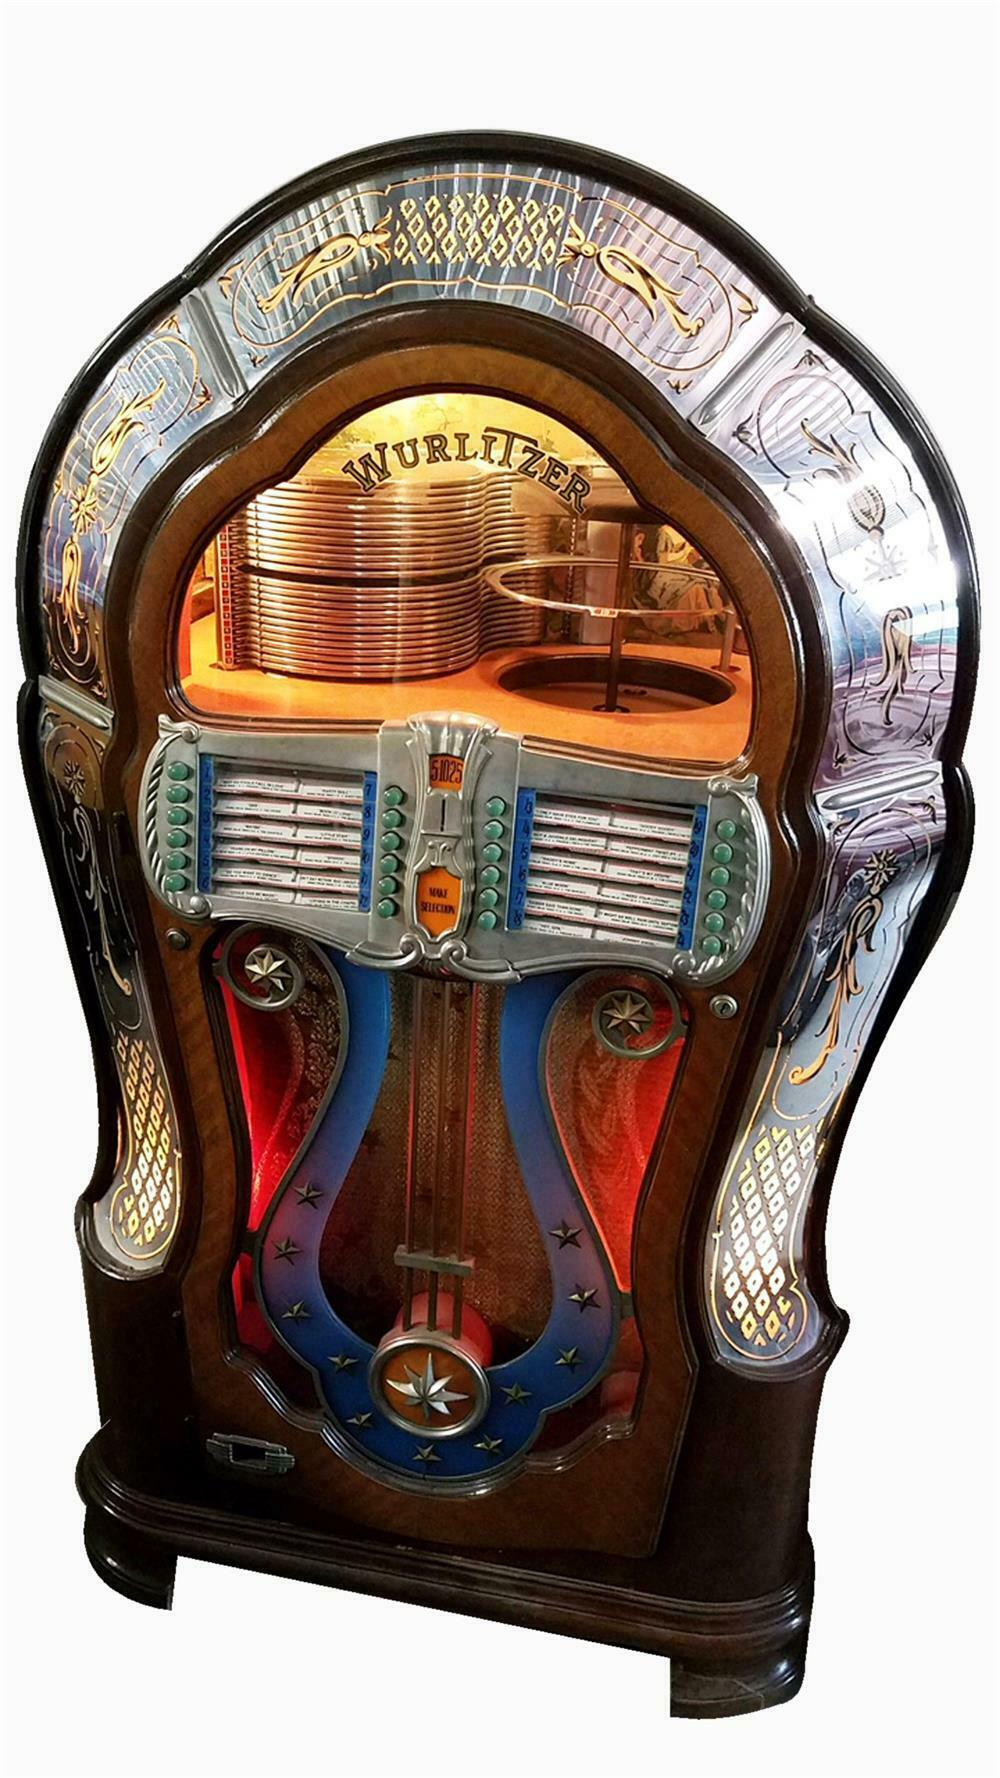 Distinctive and restored 1947 Wurlitzer model 1080 jukebox, o